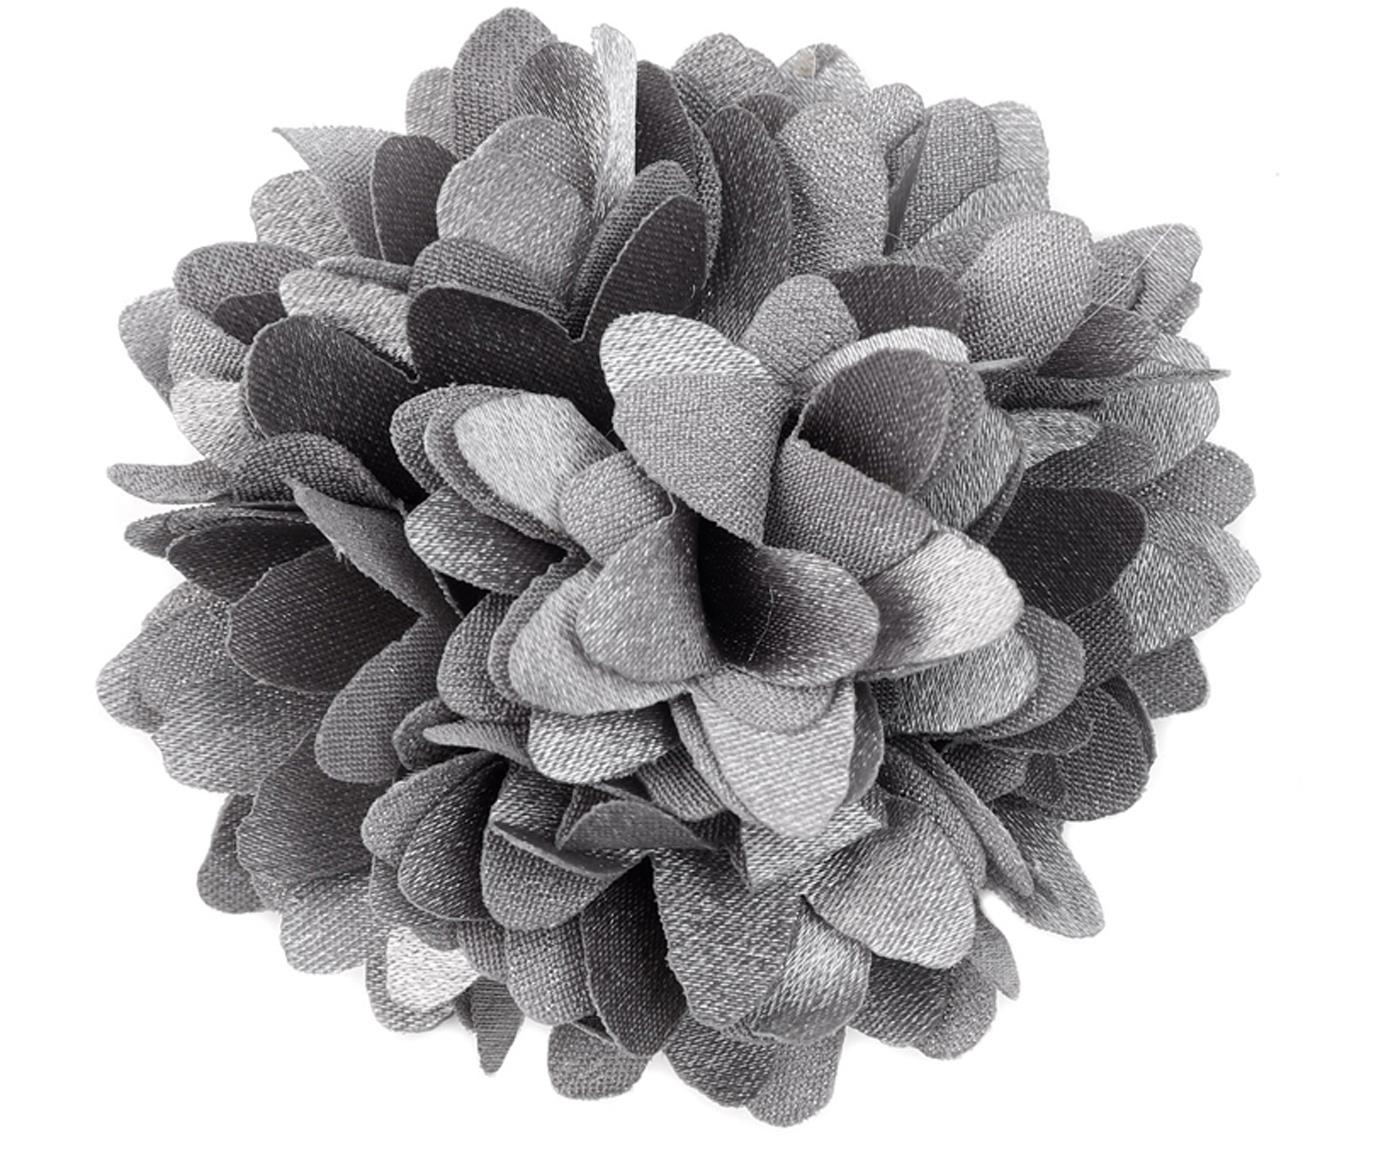 Fiori decorativi Flor, 6 pz., Poliestere, Grigio, Ø 6 cm